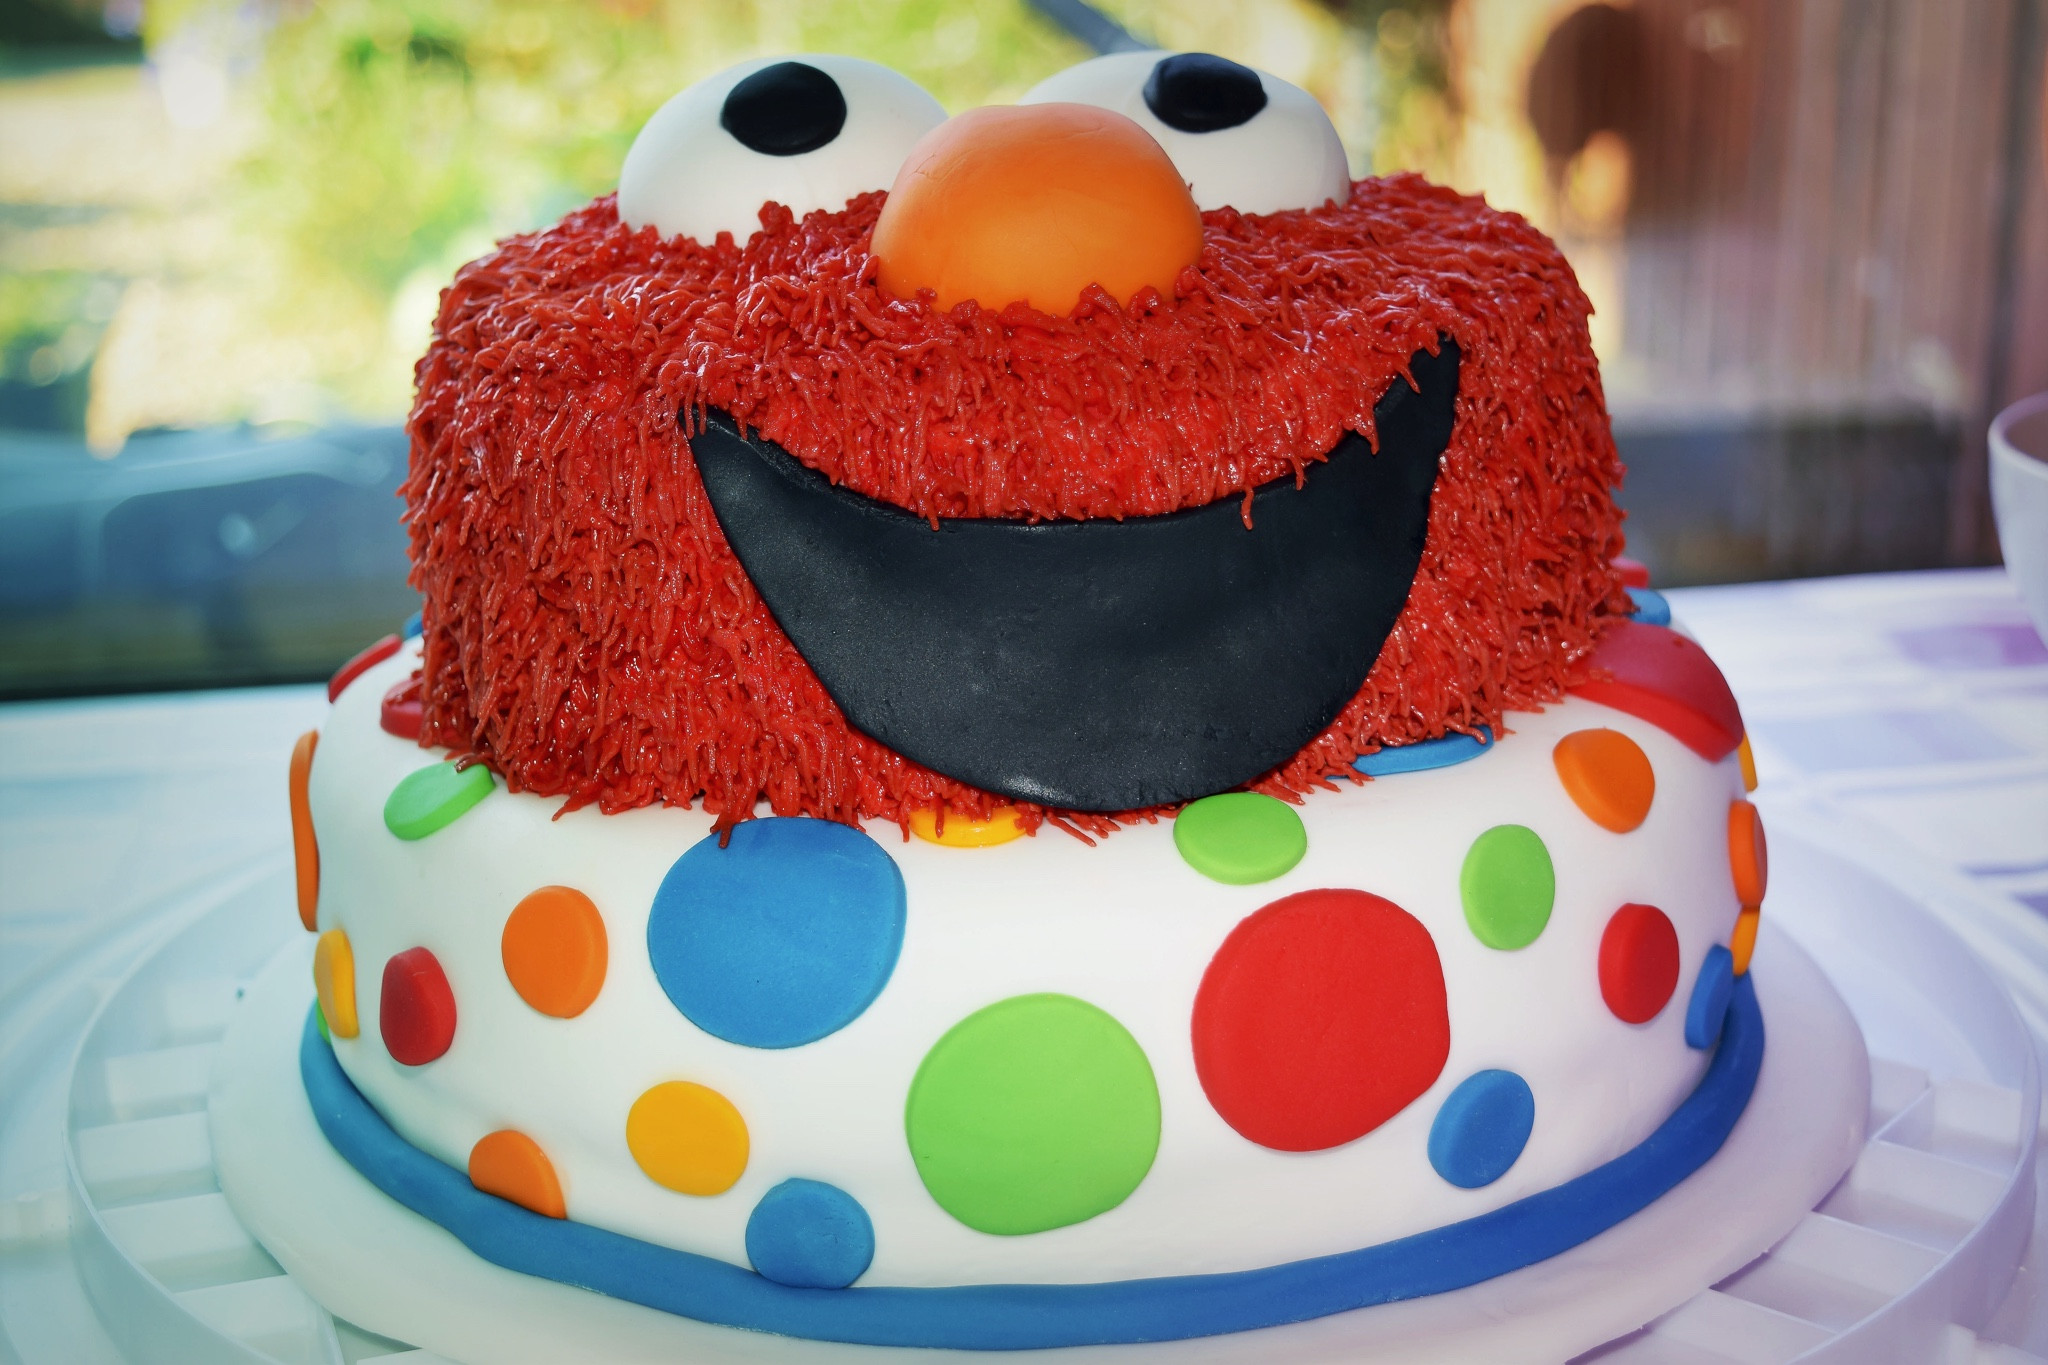 Elmo Birthday Cake  Making an Elmo birthday cake Glasgow With Kids